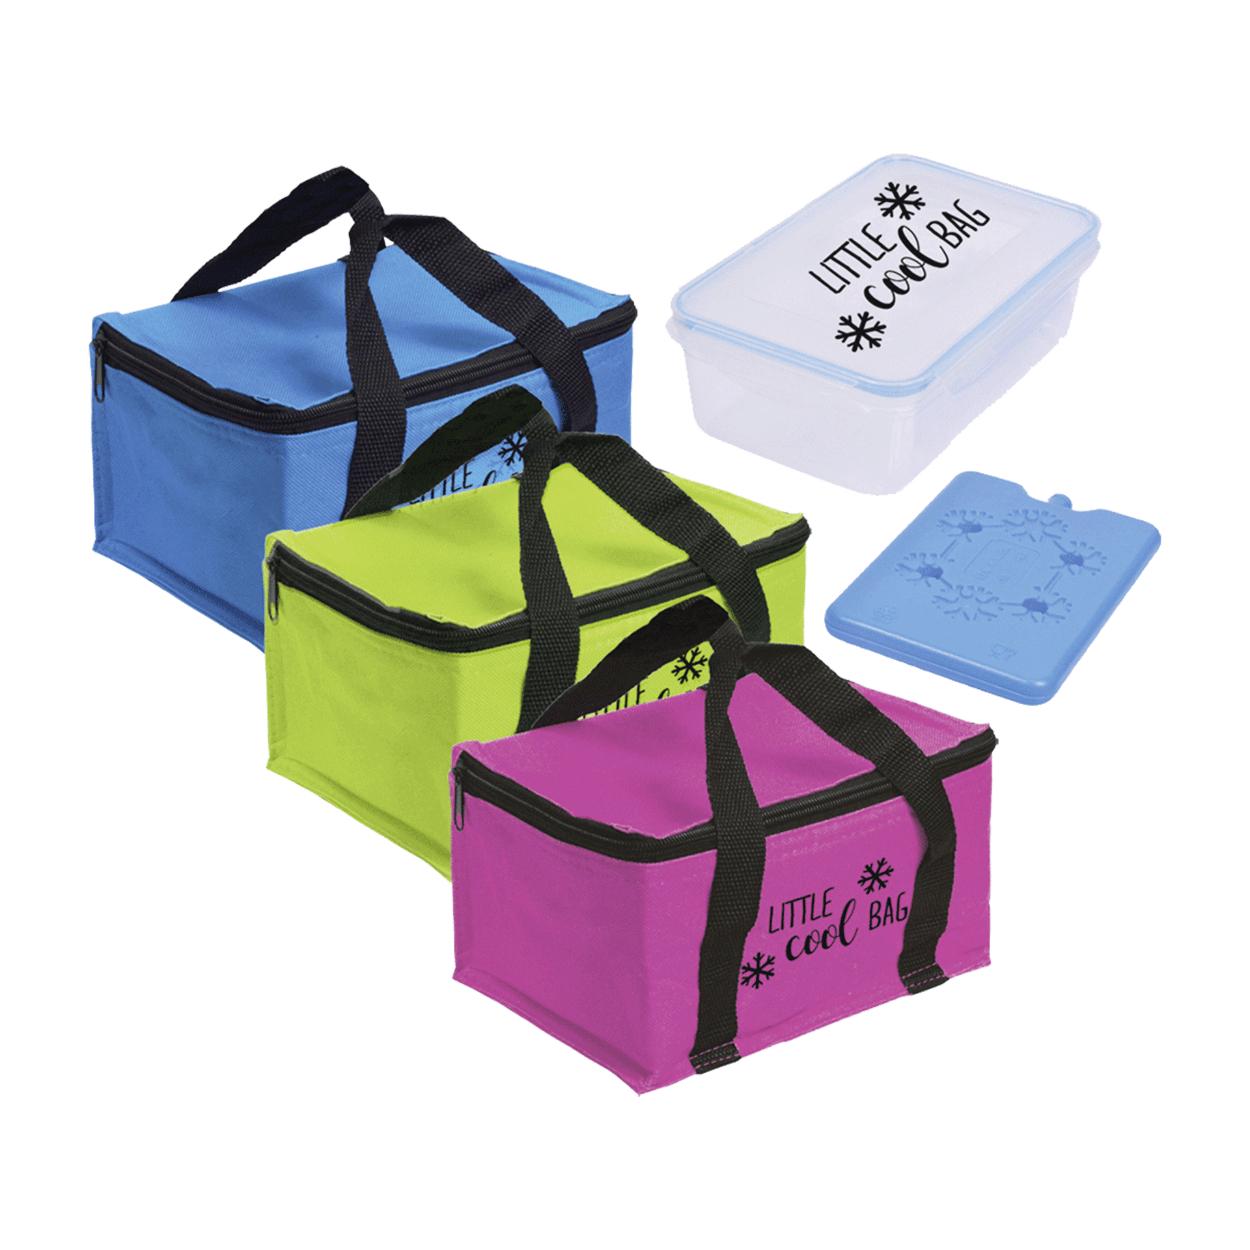 Sac isotherme + lunch box + bloc froid (différents coloris disponibles)